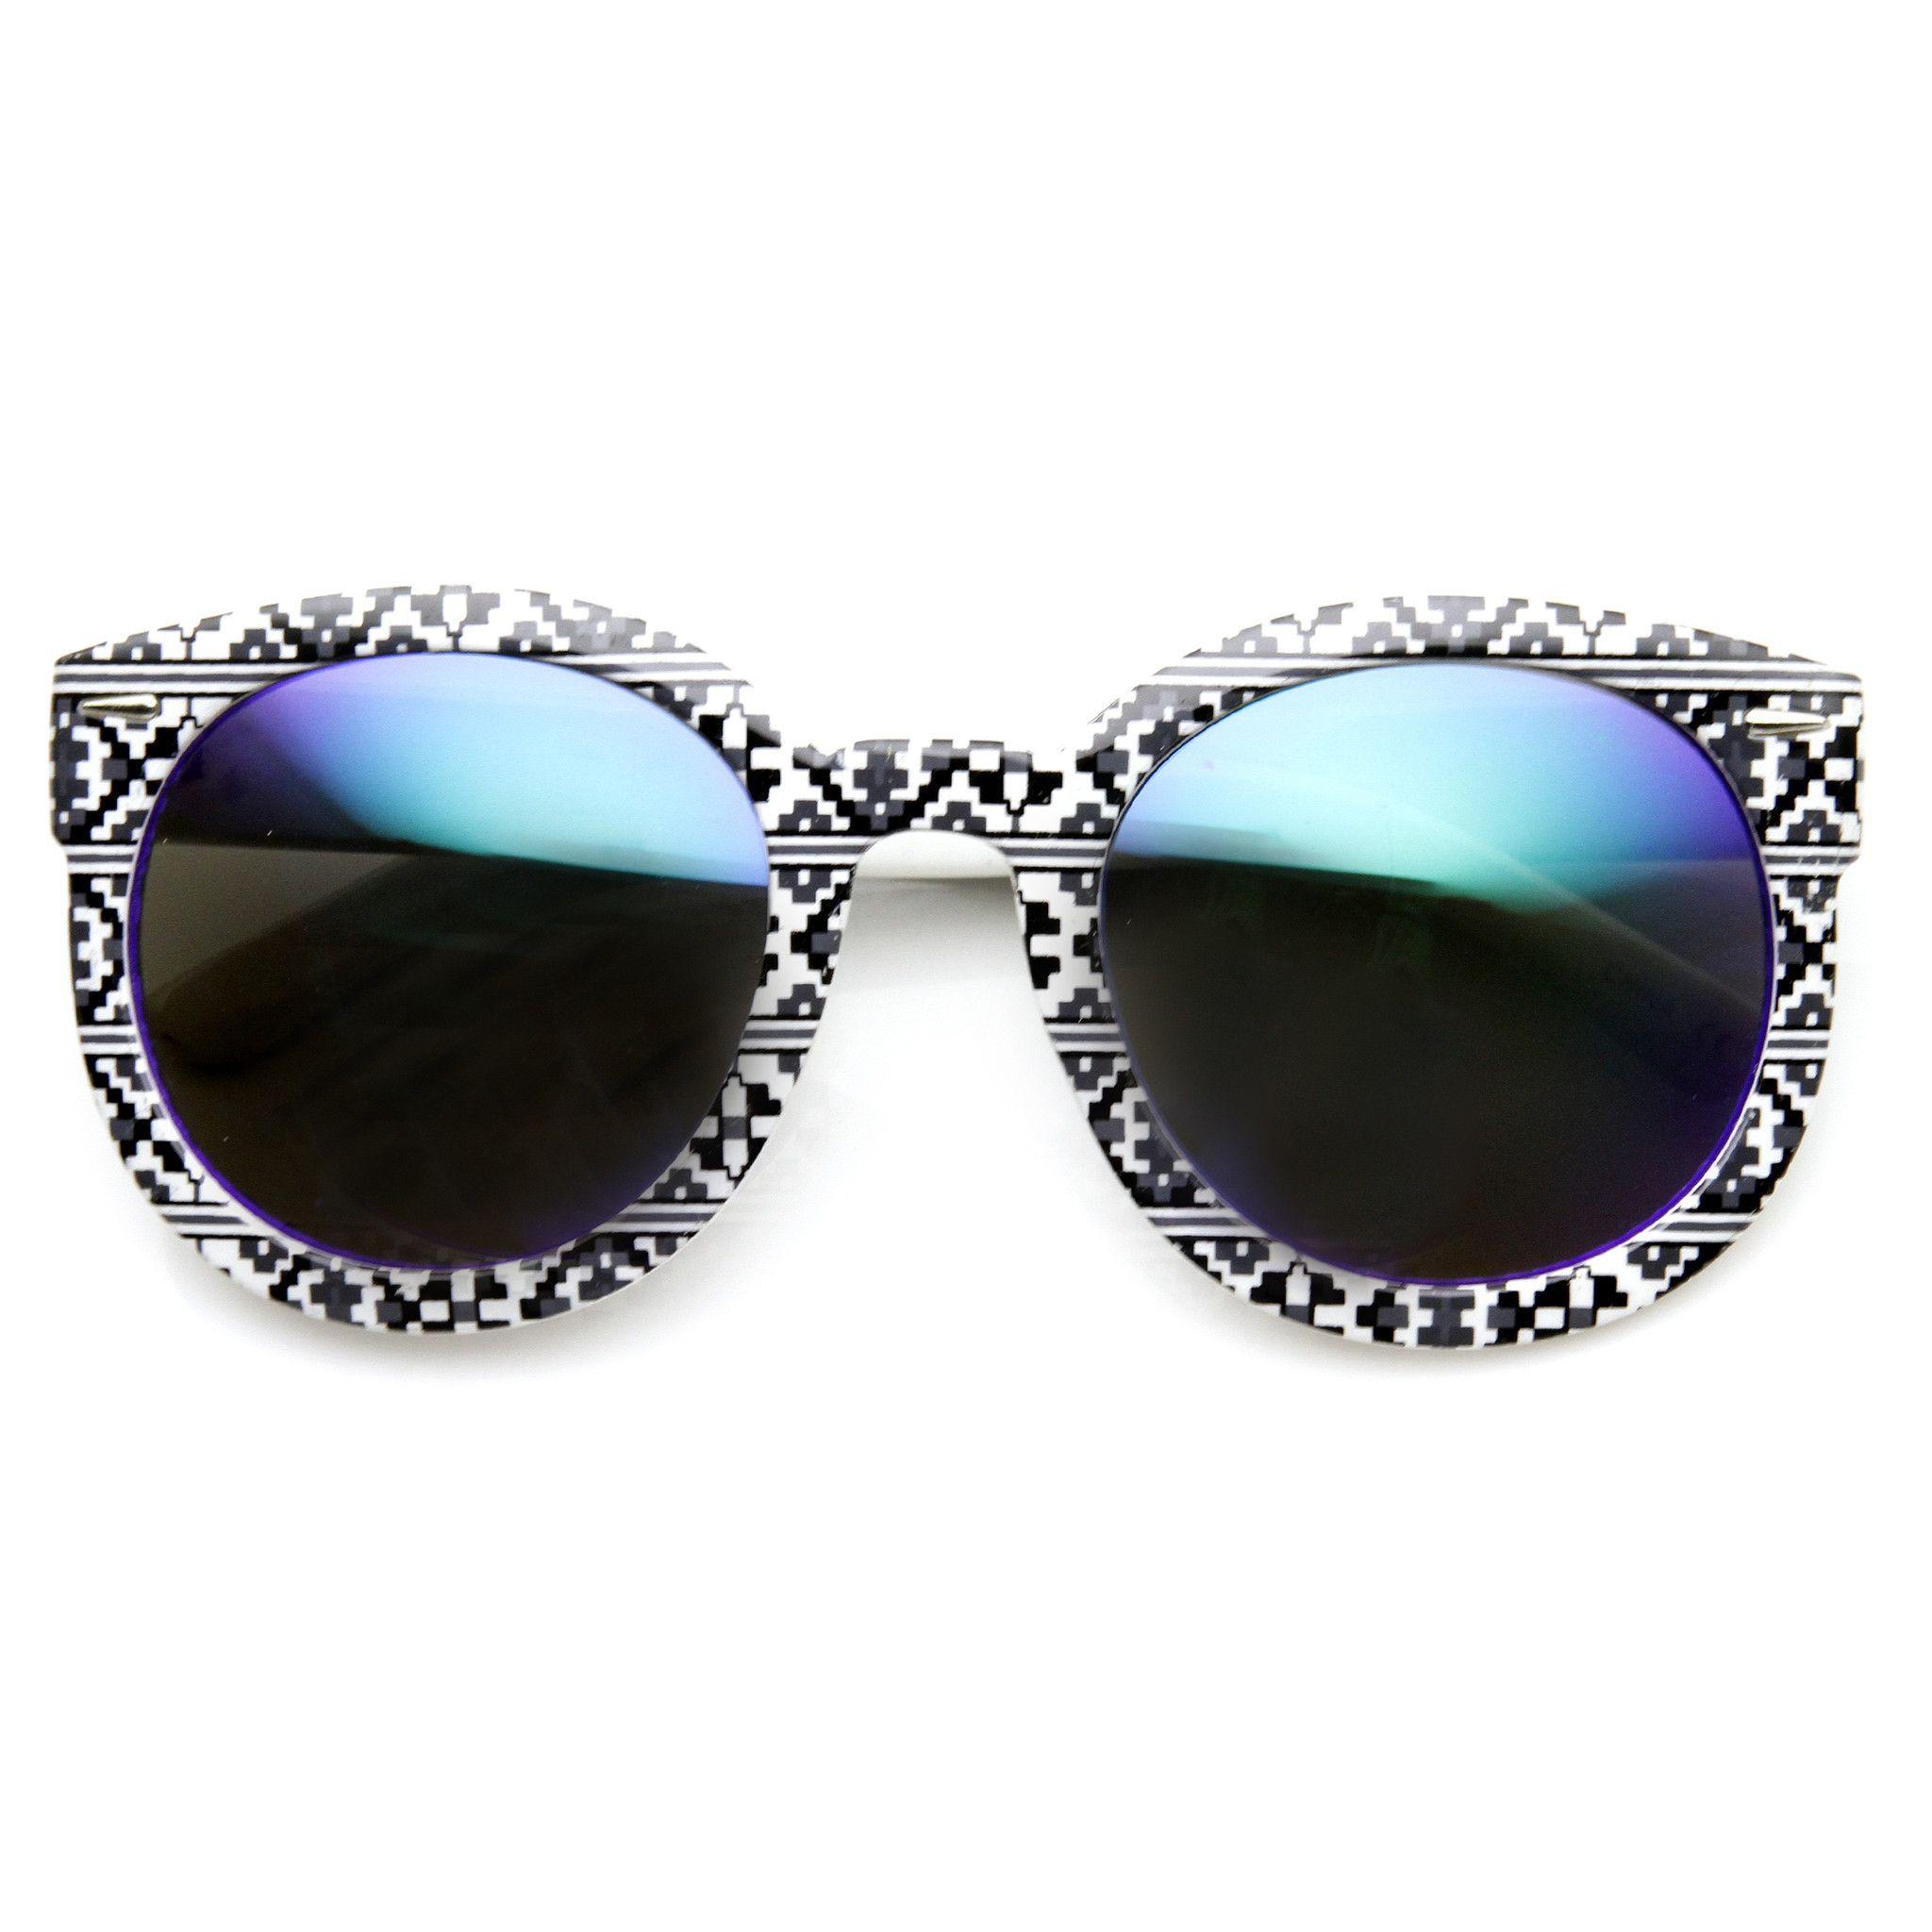 4b1ee429eaf Indie Women s Native Print Flash Mirrored Lens Round Sunglasses 9380 ...